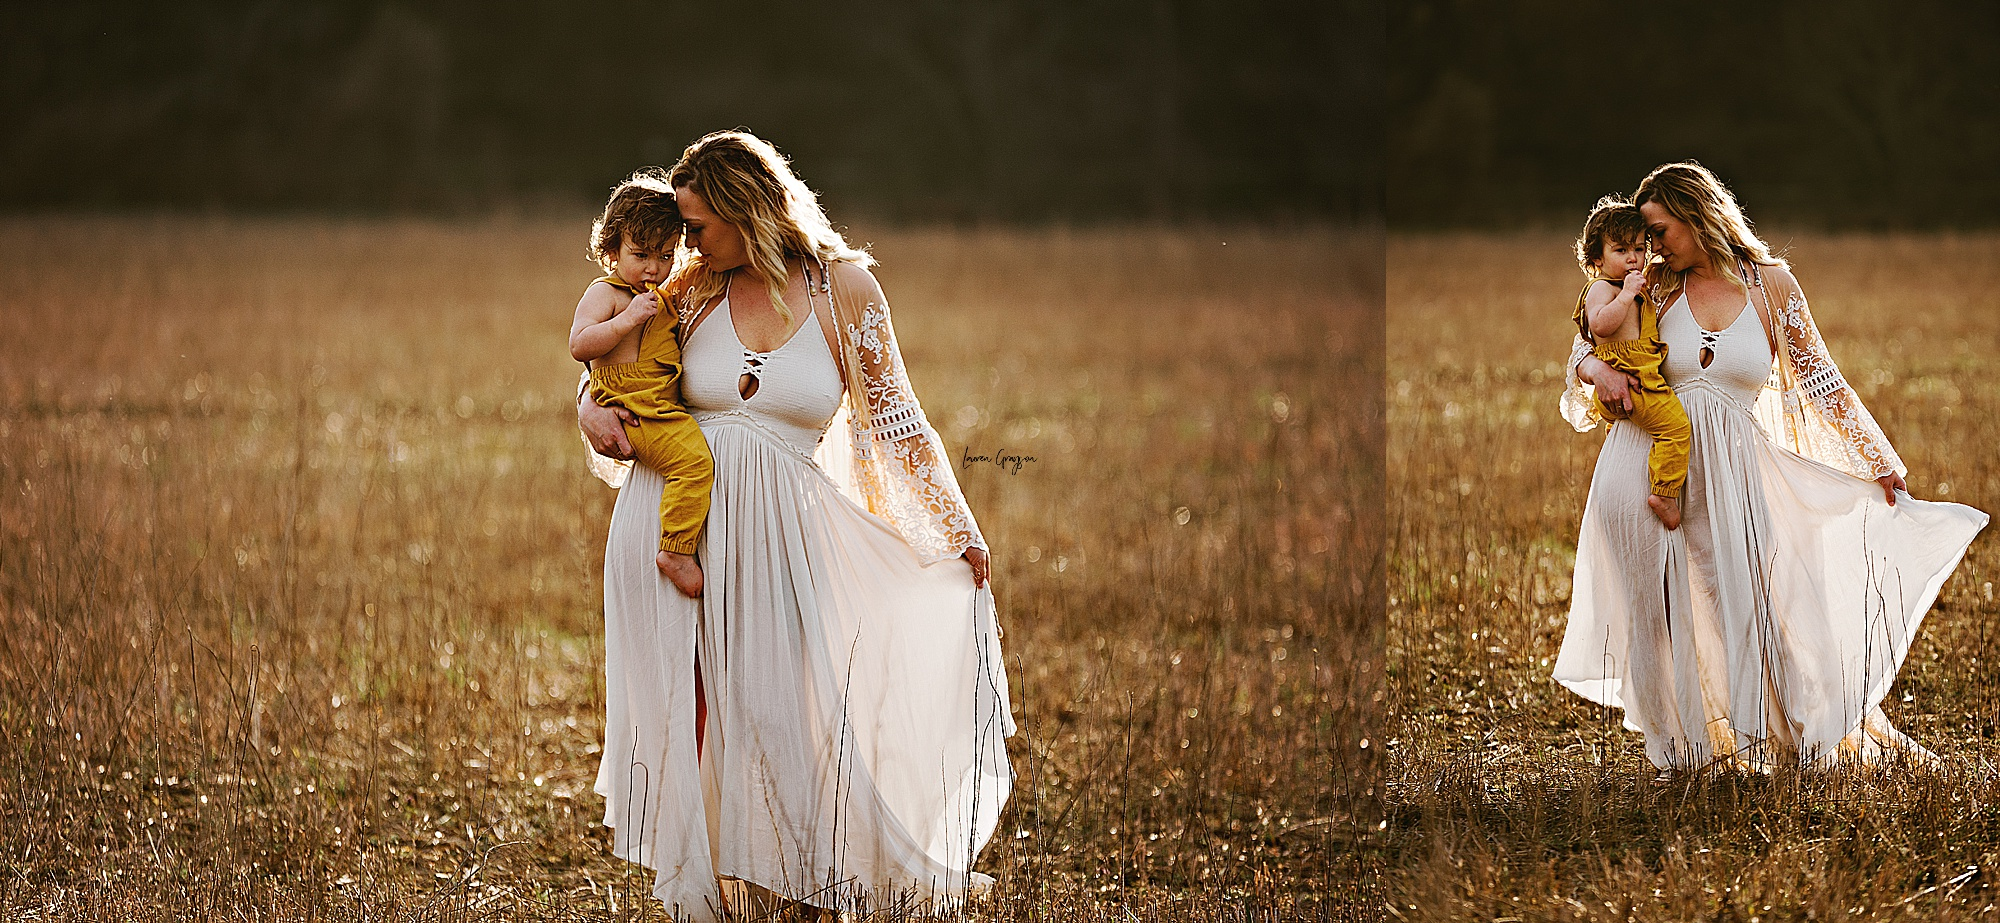 lauren-grayson-photography-akron-ohio-family-mom-boys-field-spring-outdoor-session_0004.jpg